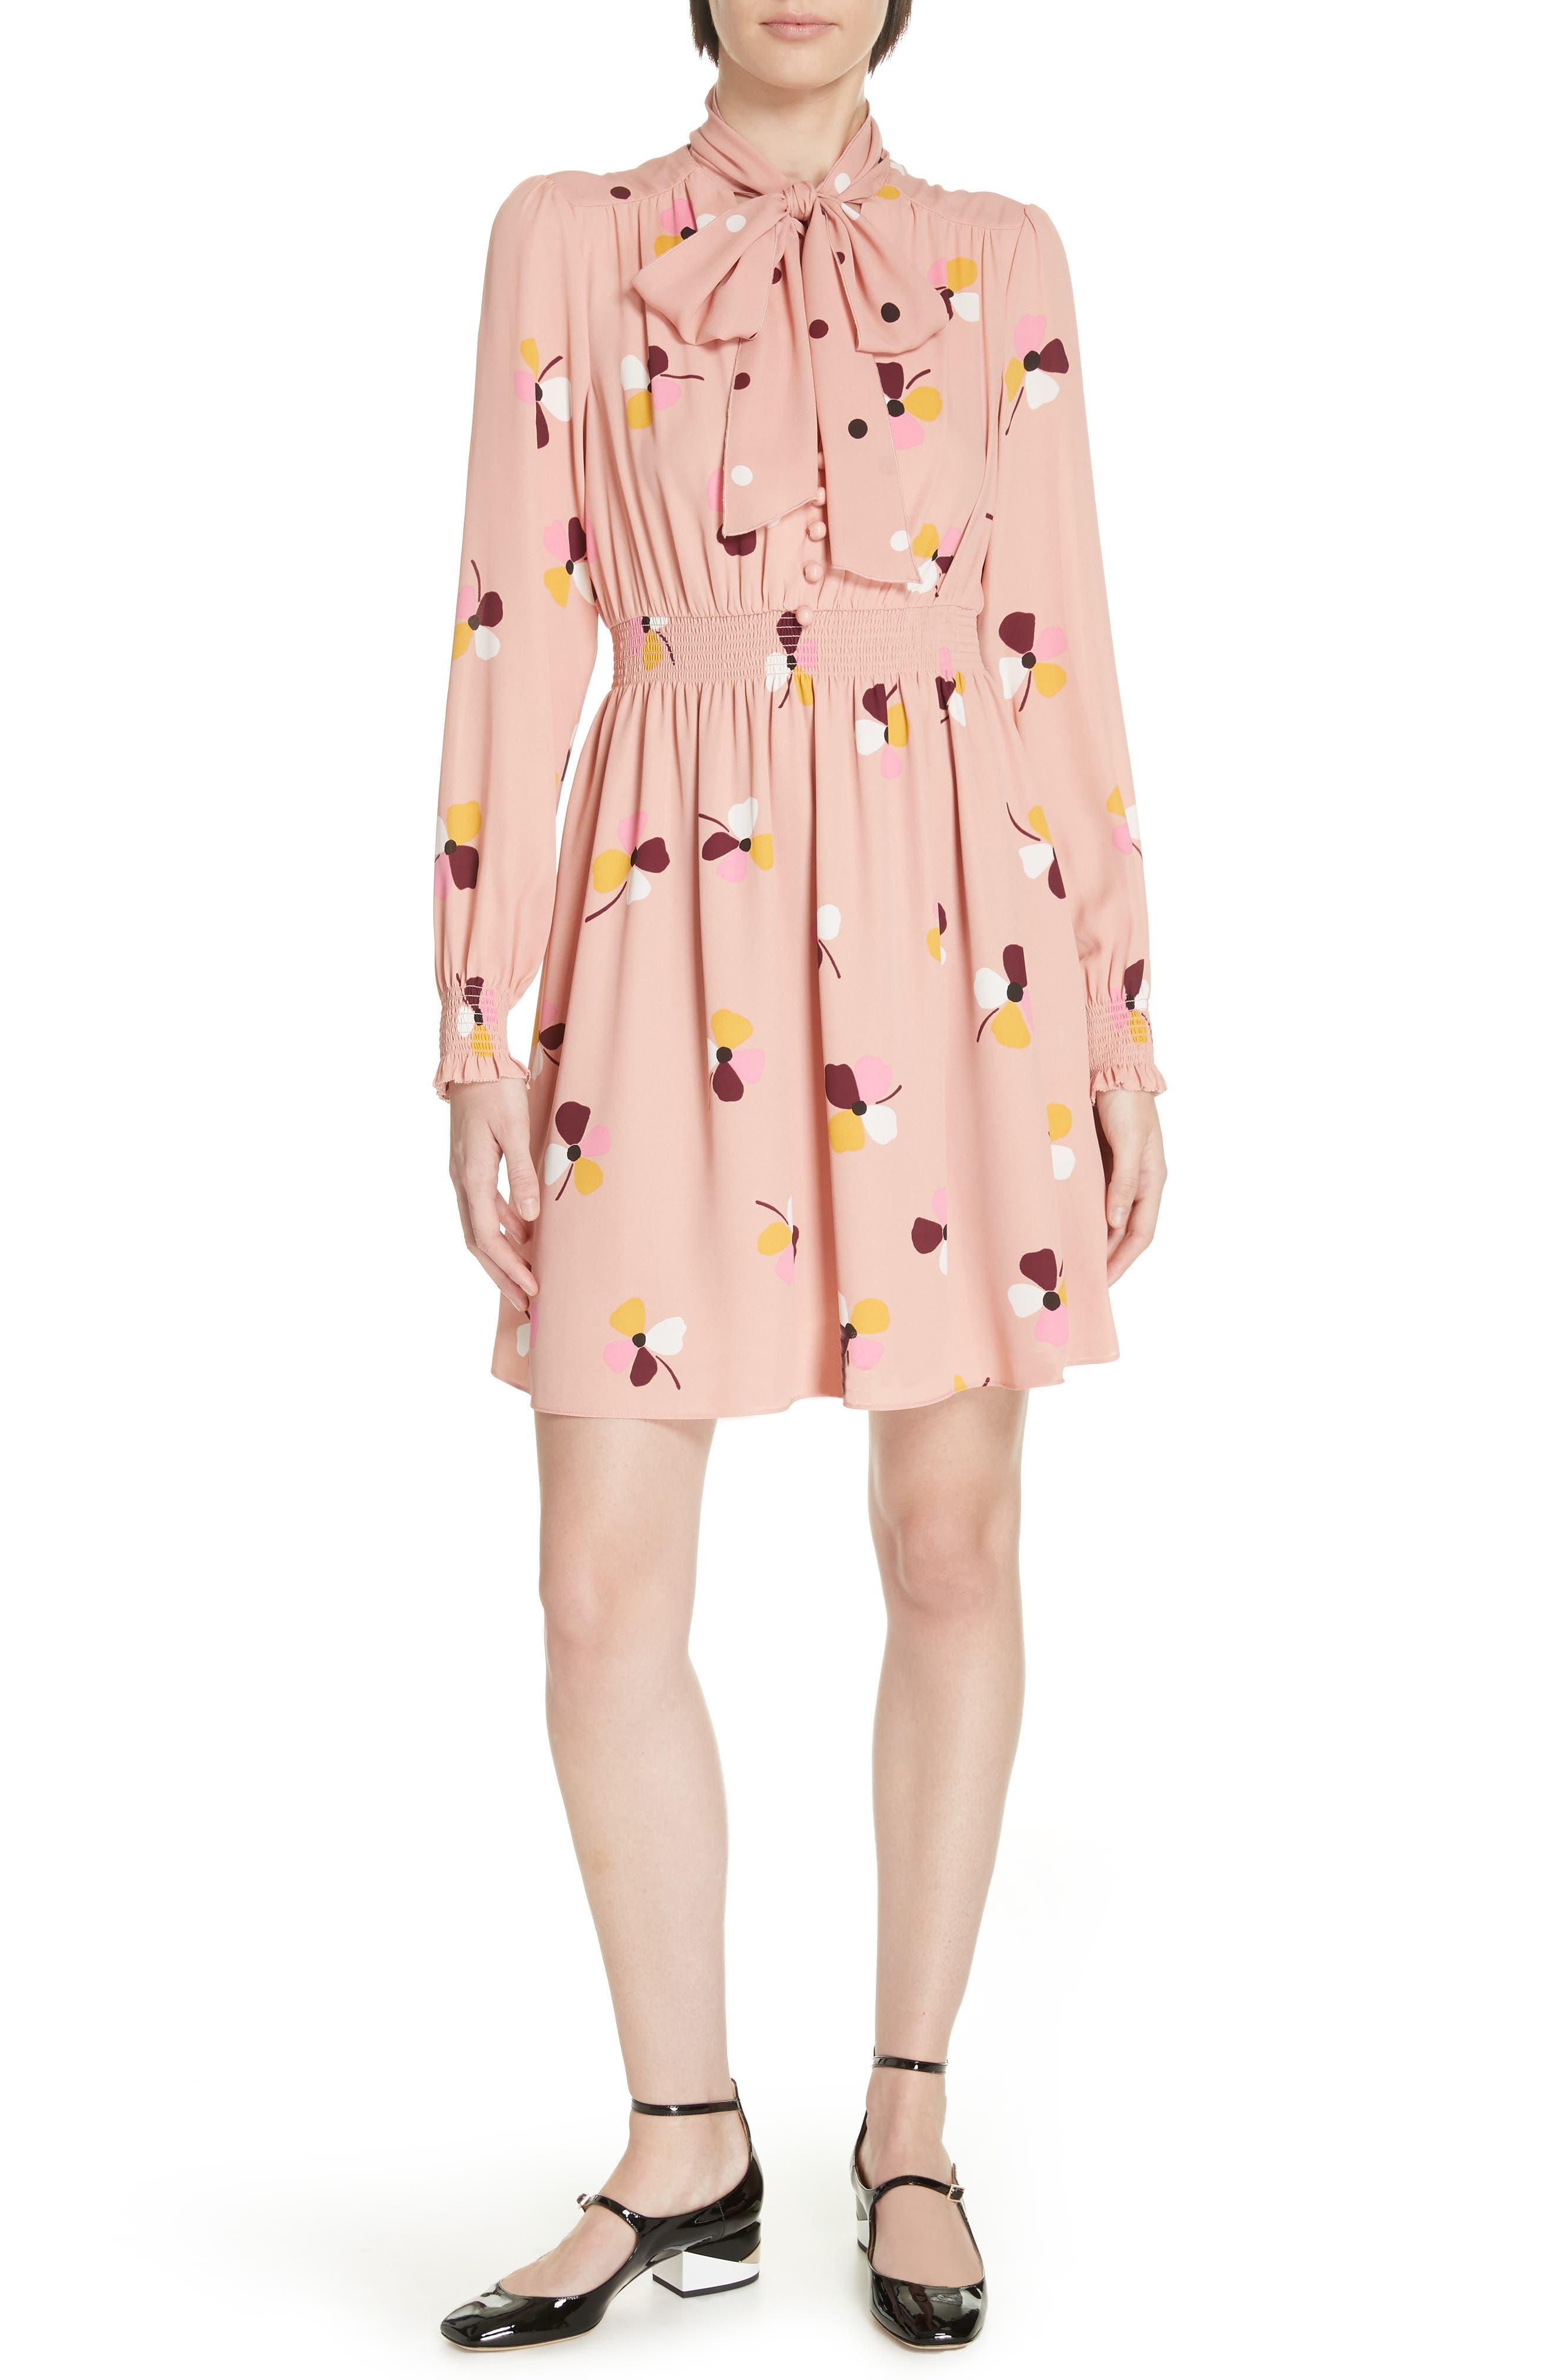 Kate Spade New York Dusk Buds Print Tie Neck Dress, Pink